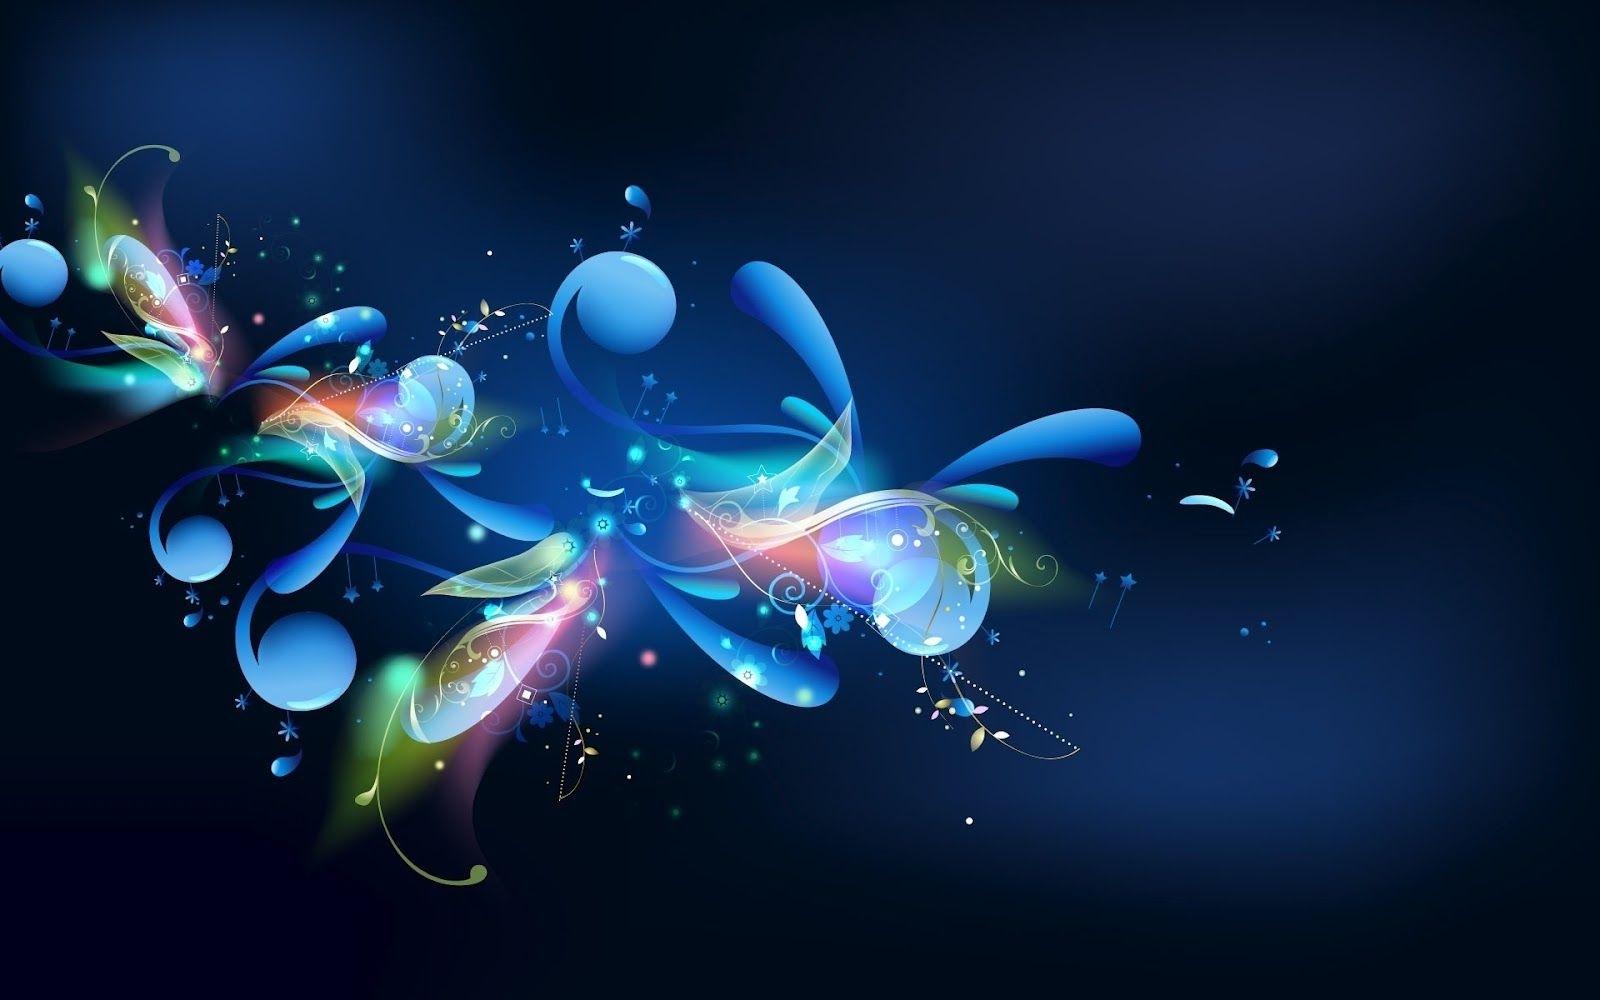 beautiful desktop wallpaper hd for windows 8 - diariovea